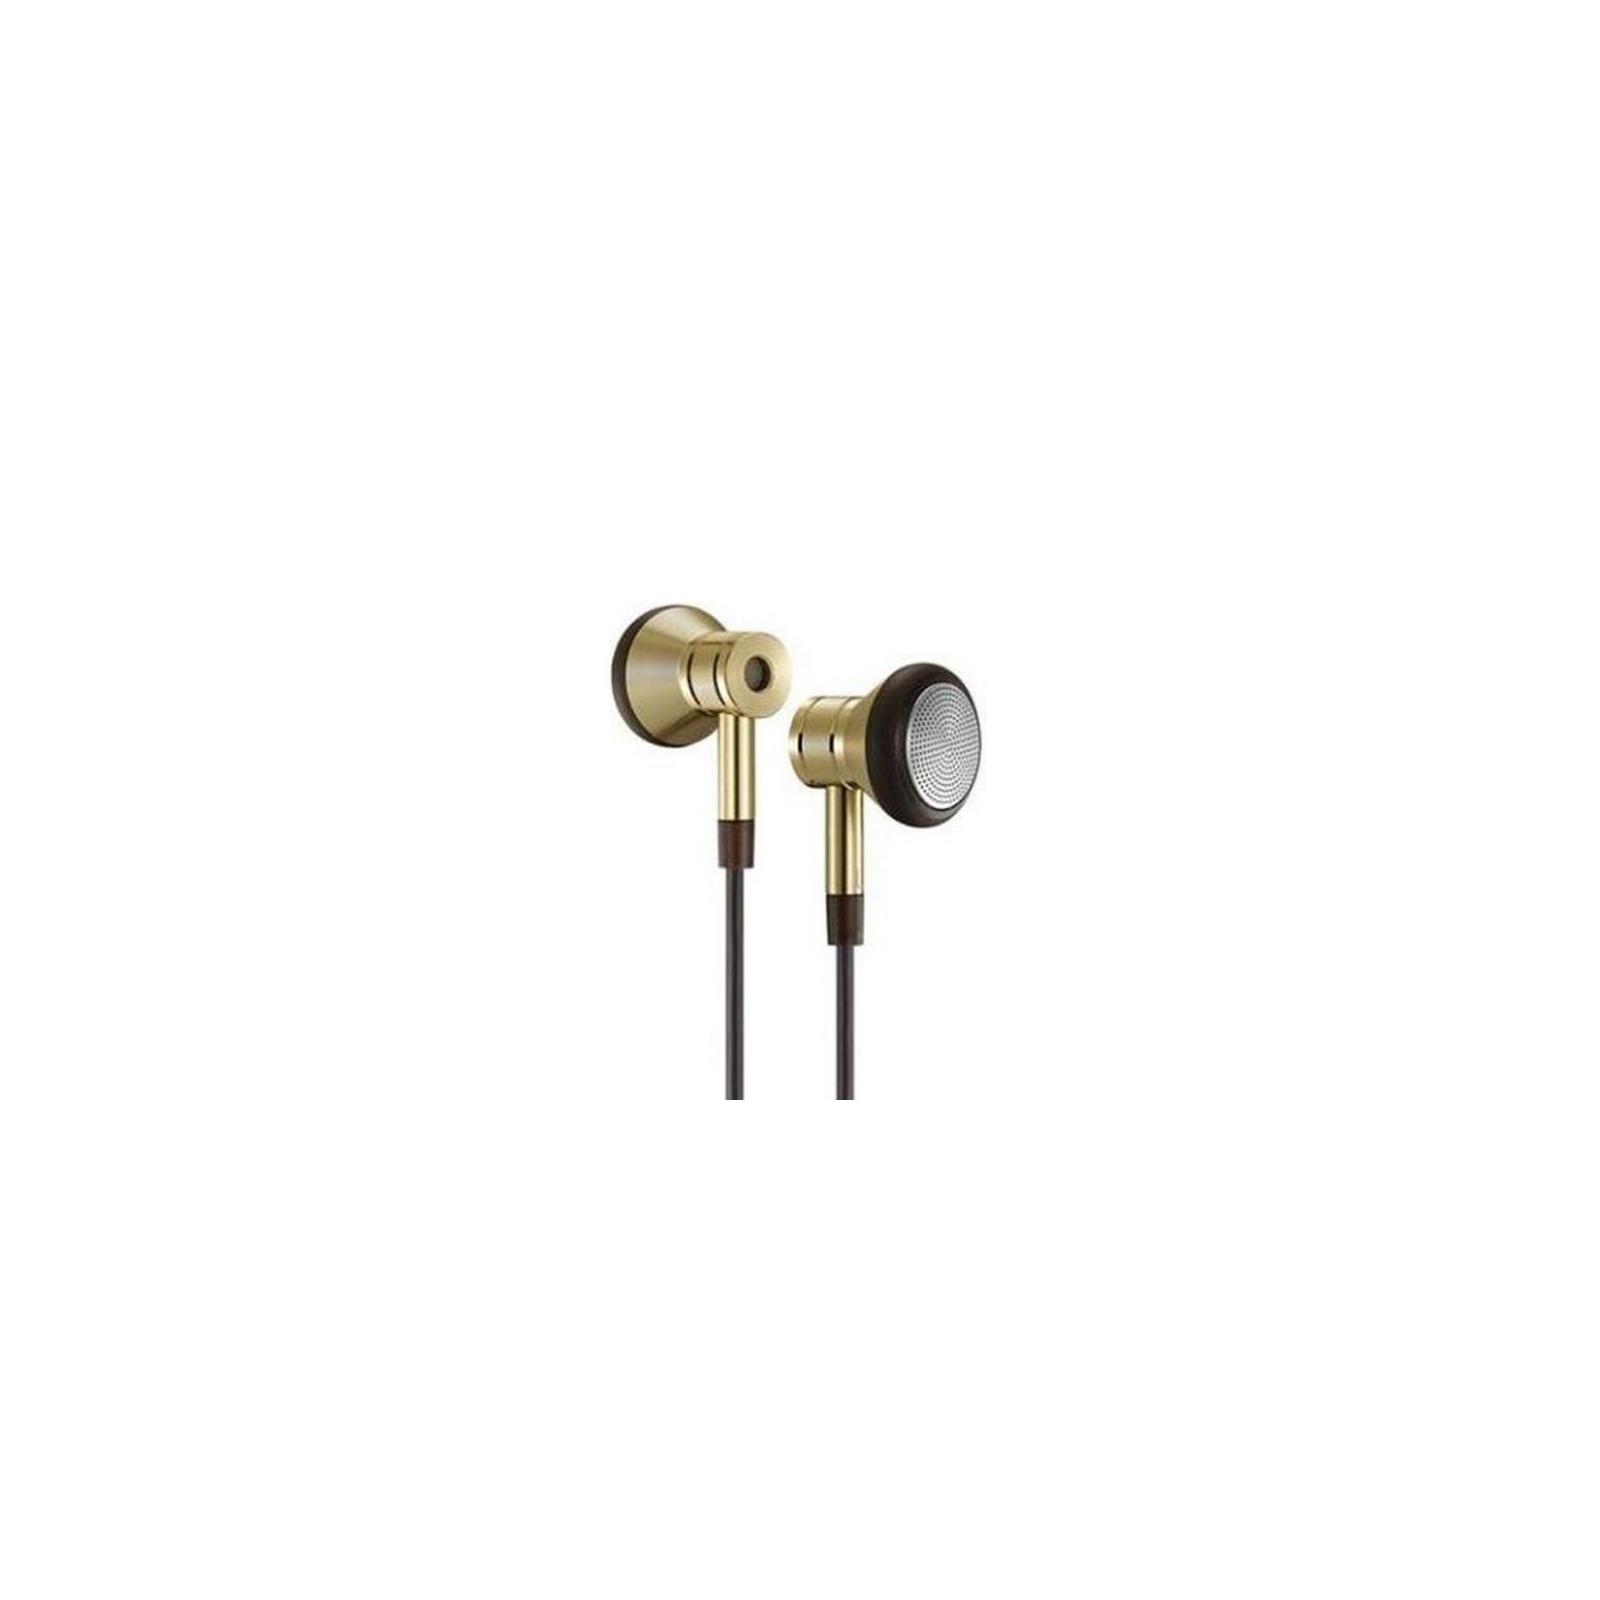 Наушники 1MORE EO320 Piston Earphone Mic Gold (EO320-GOLD) изображение 2